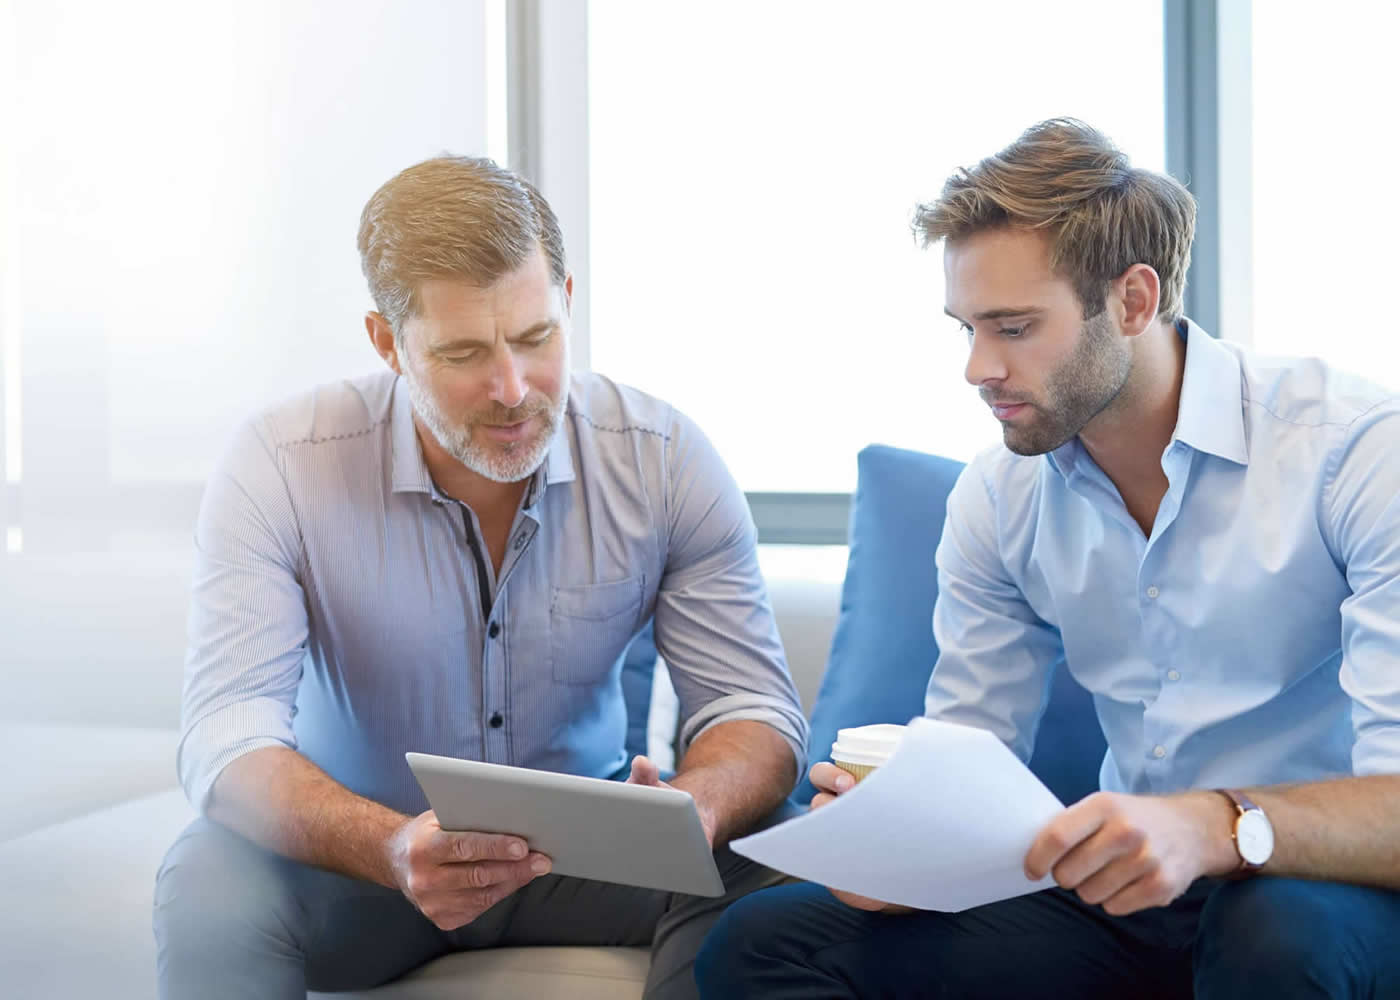 naem-2018-article-mature-businessman-using-digital-tablet-discuss-700x500